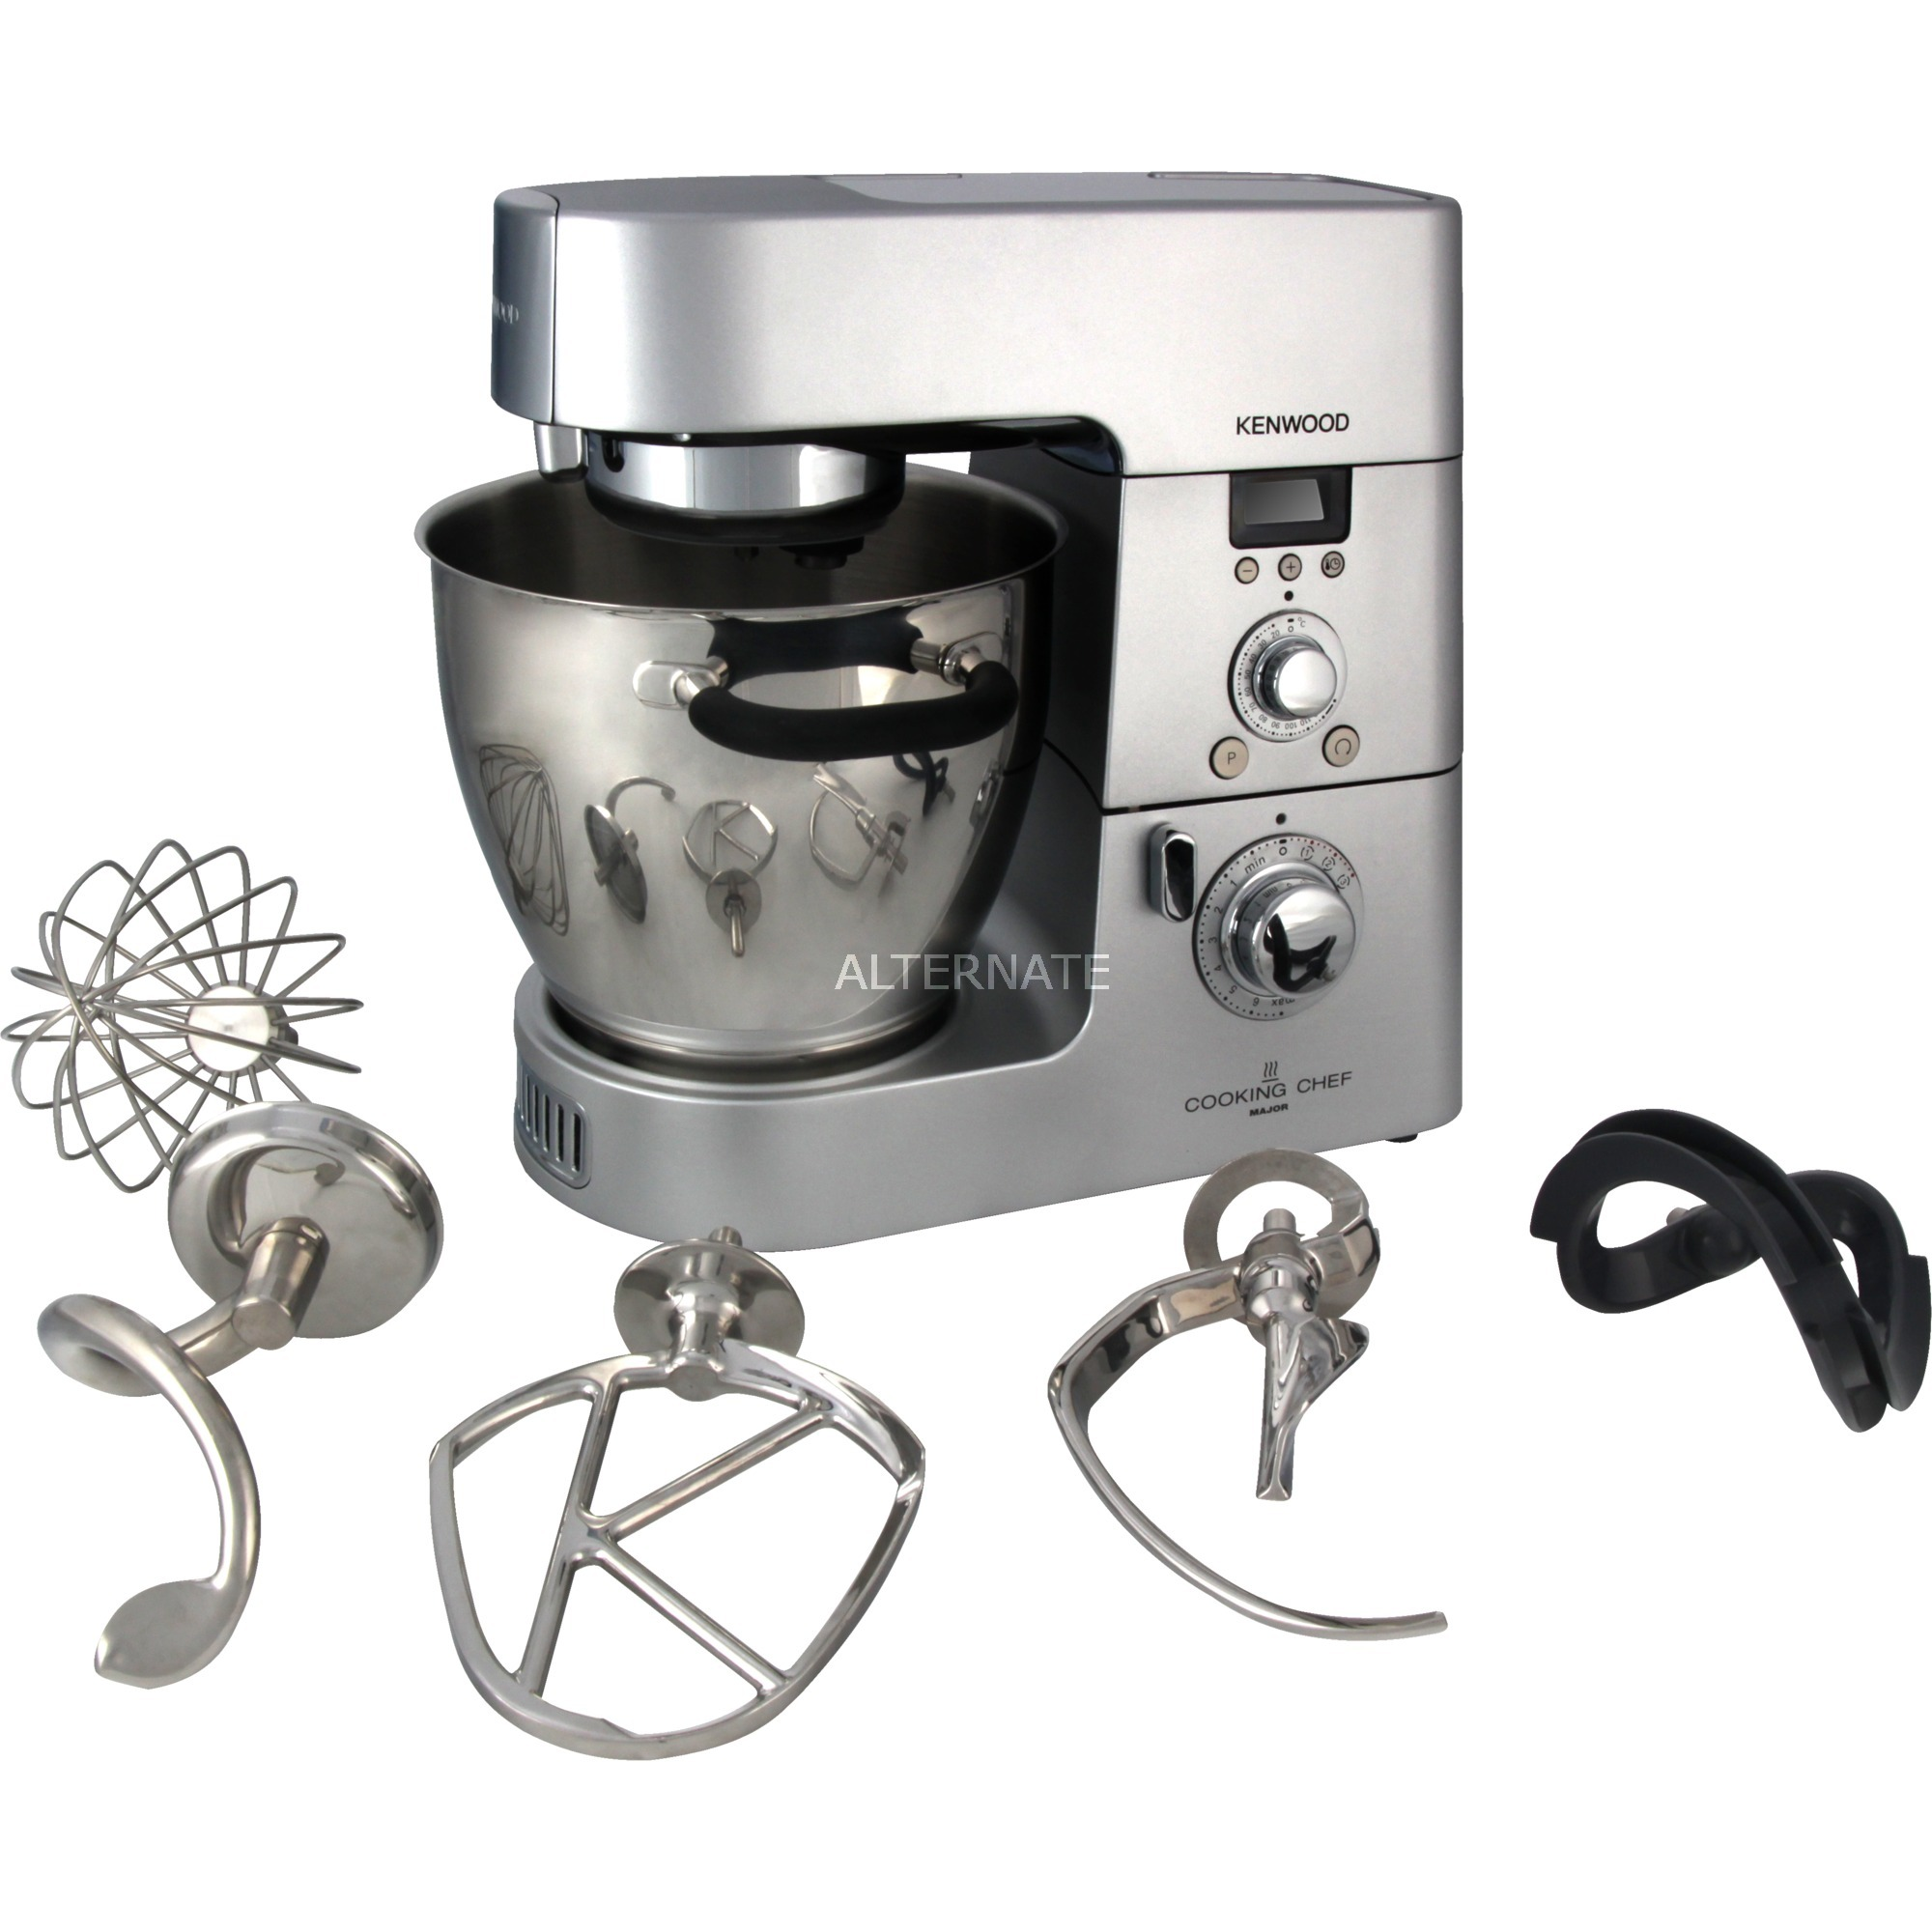 Kenwood Cooking Chef KM094, Robot da cucina argento